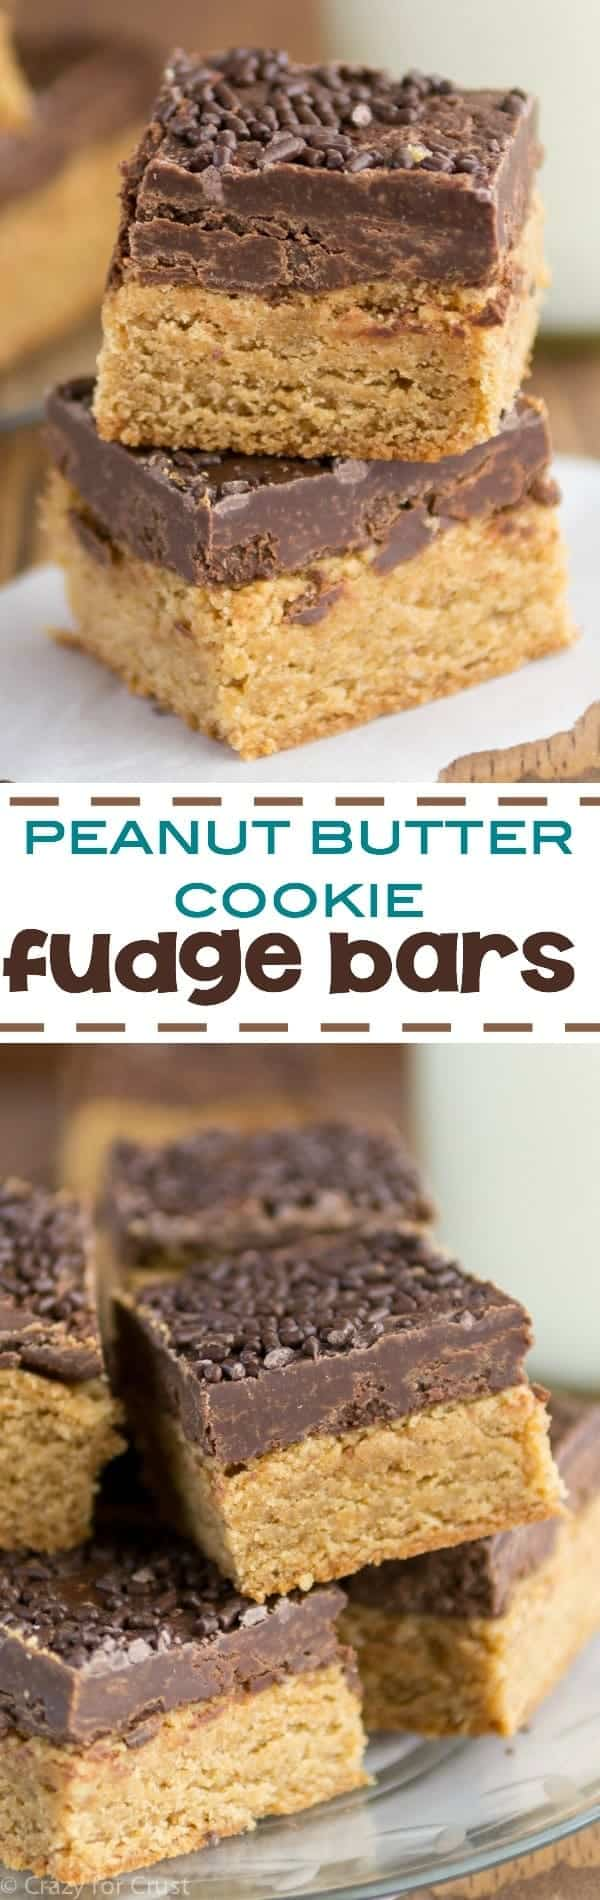 Peanut Butter Cookie Fudge Bars